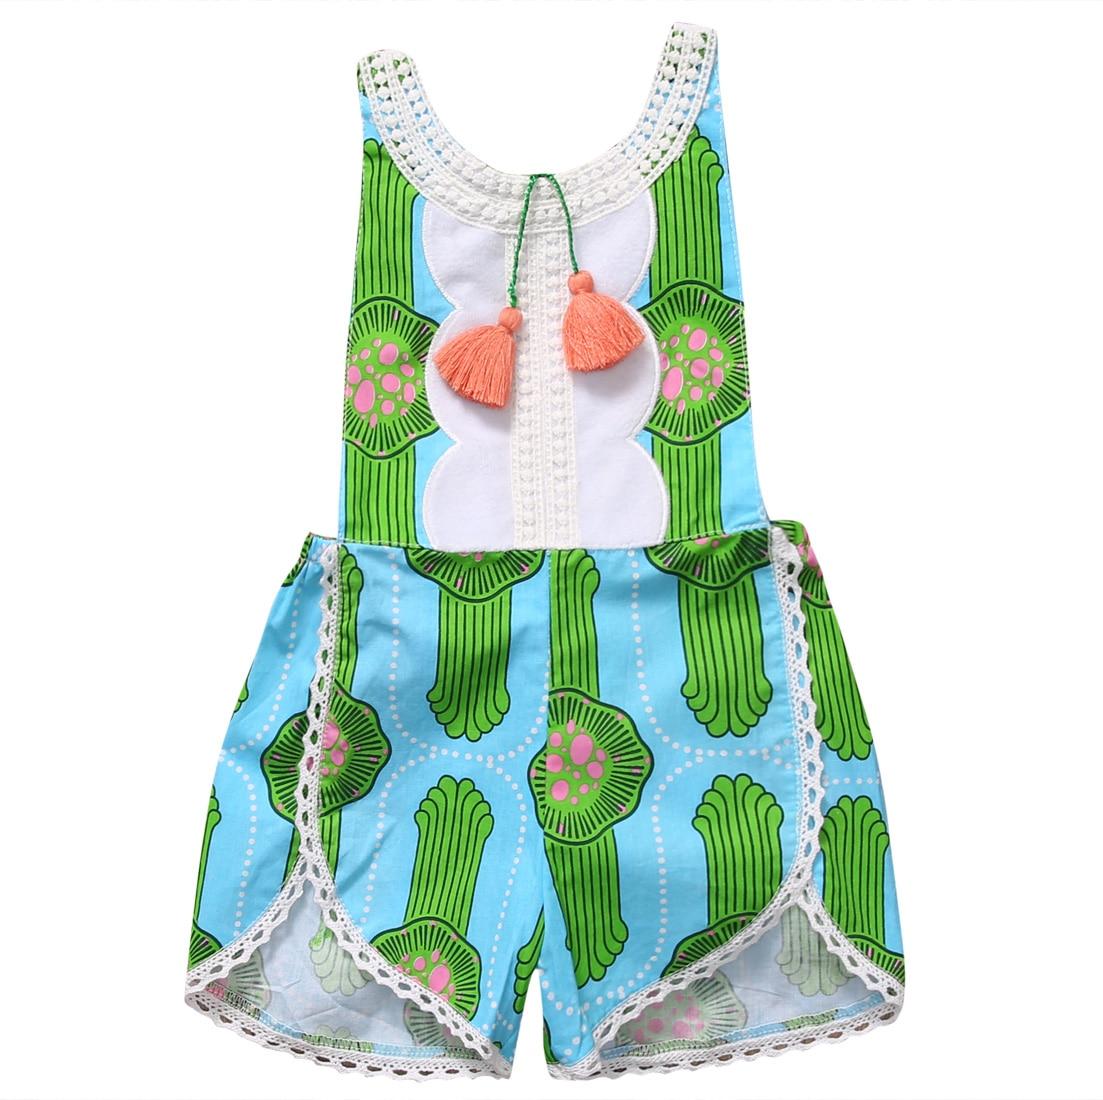 2017 Cute Cactus Summer Toddler Baby Girl Tassels Jumper Romper Jumpsuit Sunsuit Clothes